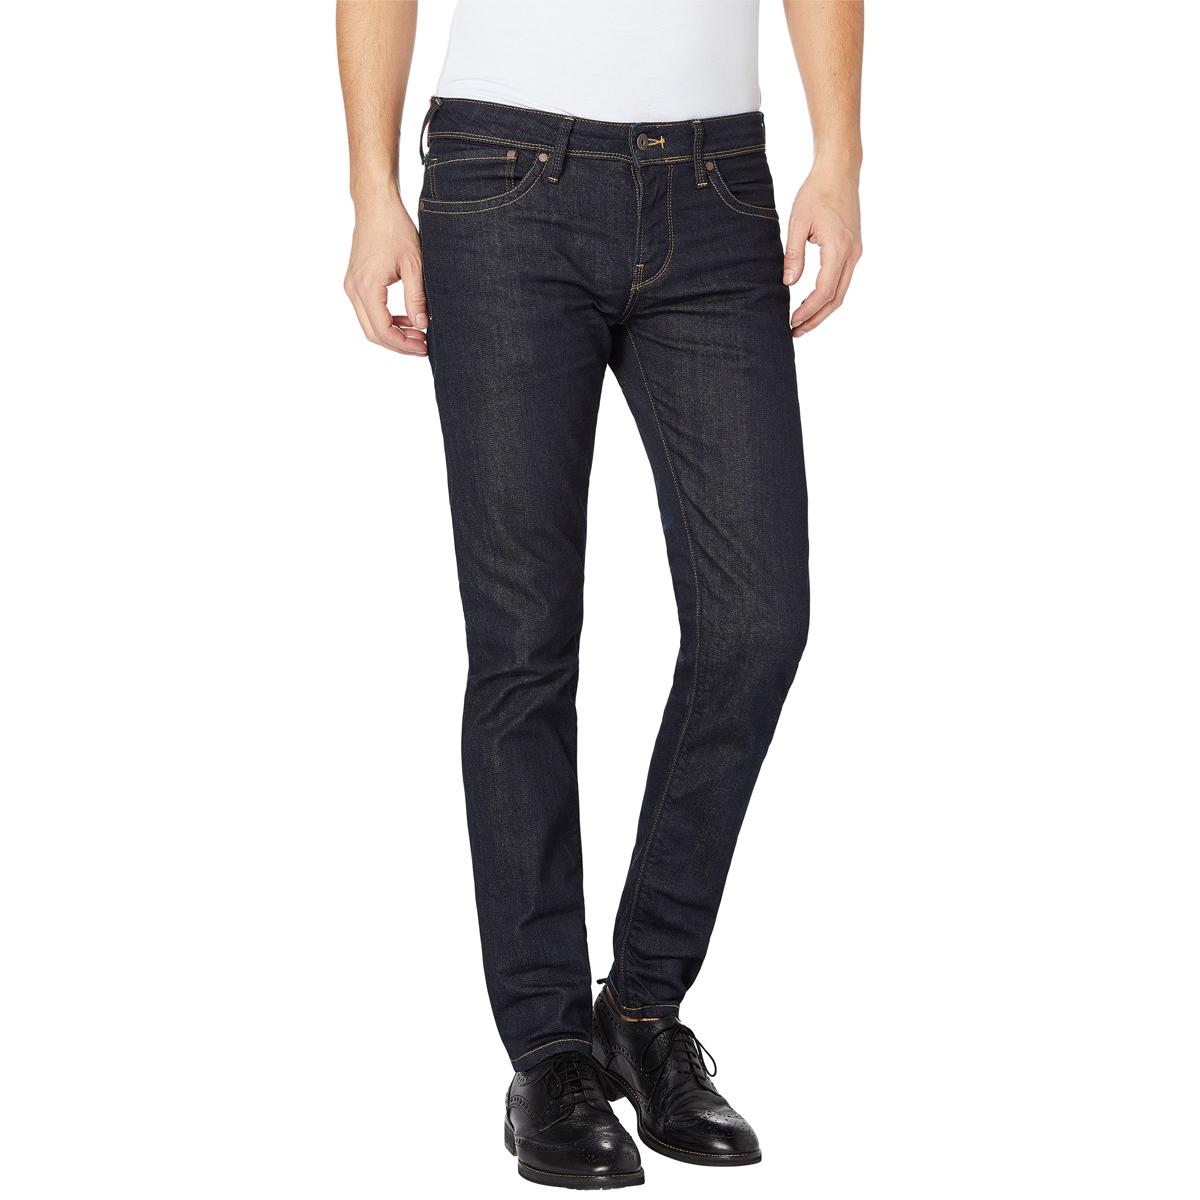 Джинсы мужские Pepe Jeans Hatch, цвет: черный. 097.PM200823.H05.000. Размер 32-32 (48-32)